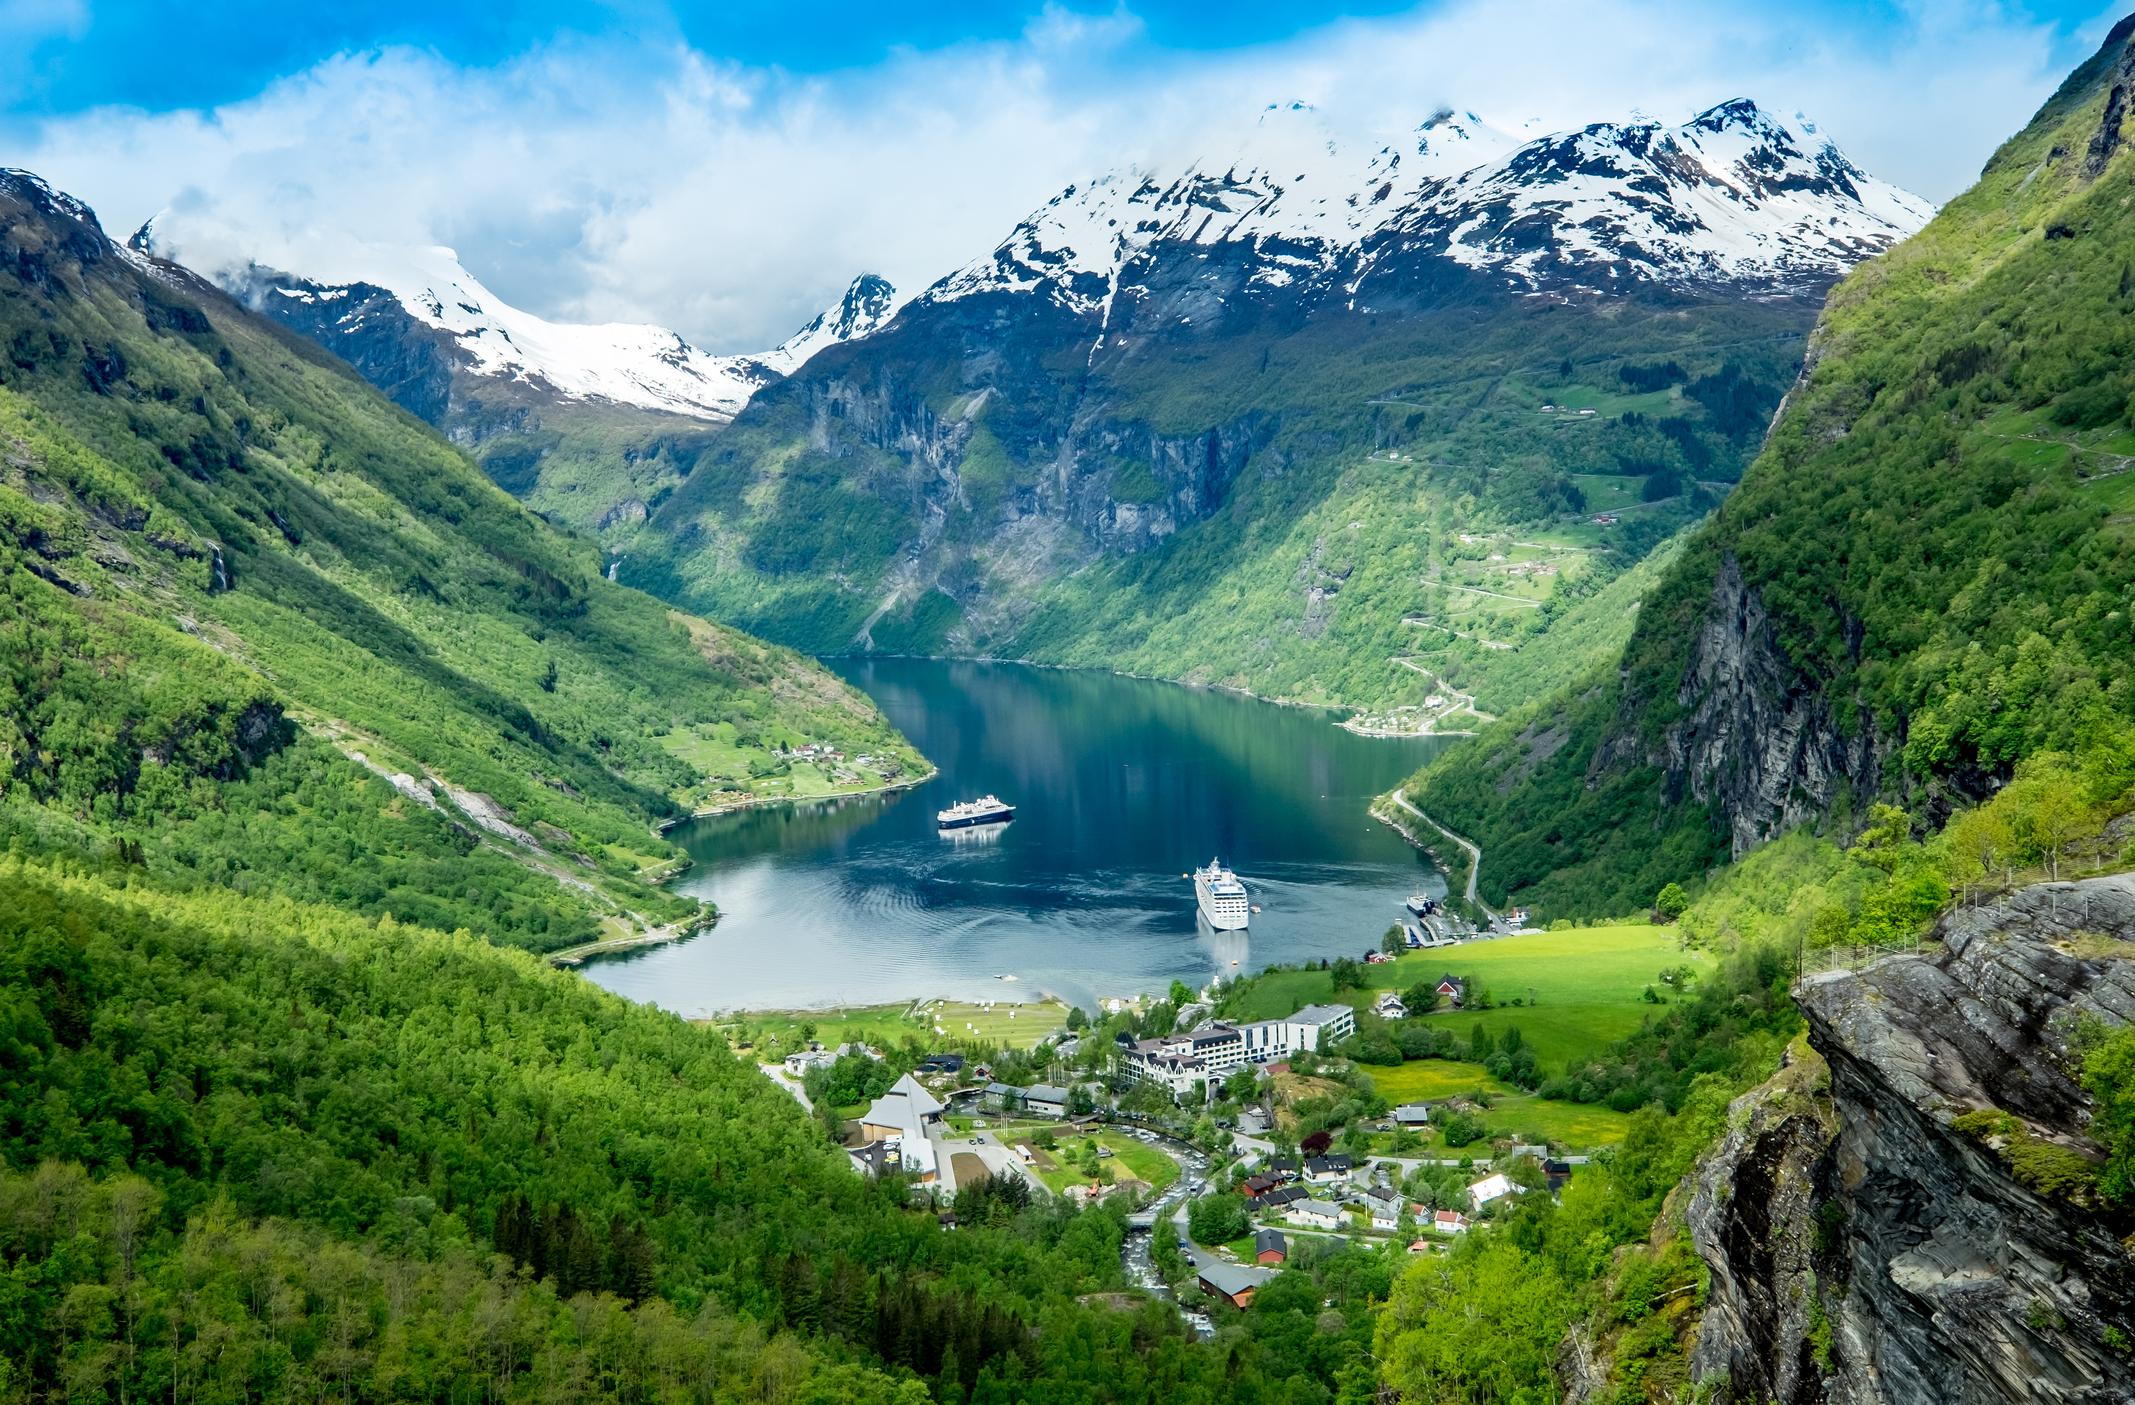 Norway's Geiranger Fjord